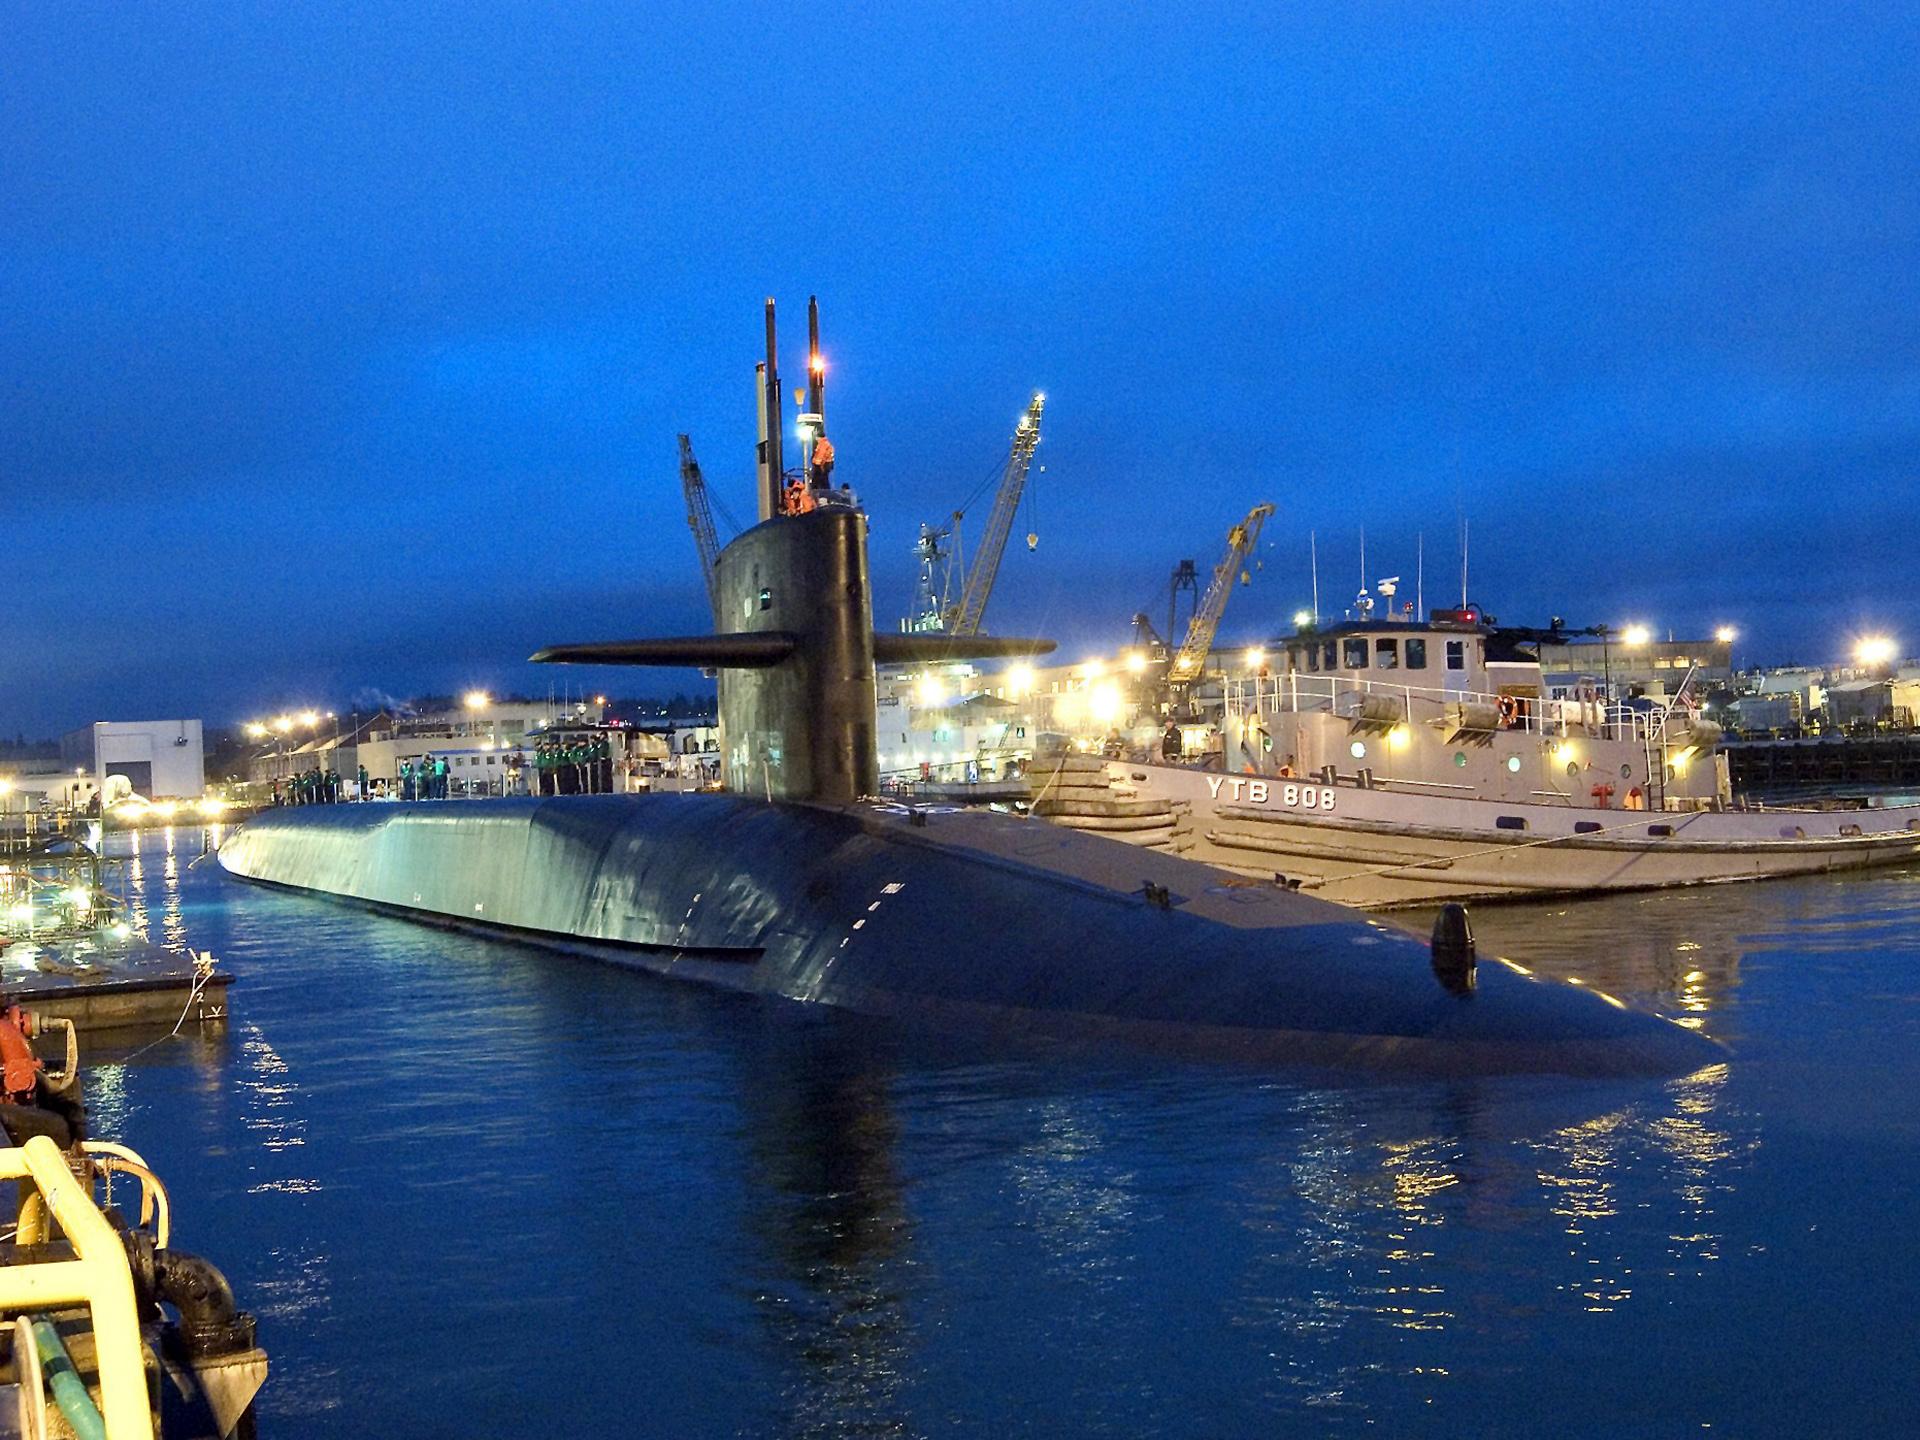 uss ohio submarine 1920x1440 4 3 back to wallpaper back home 1920x1440